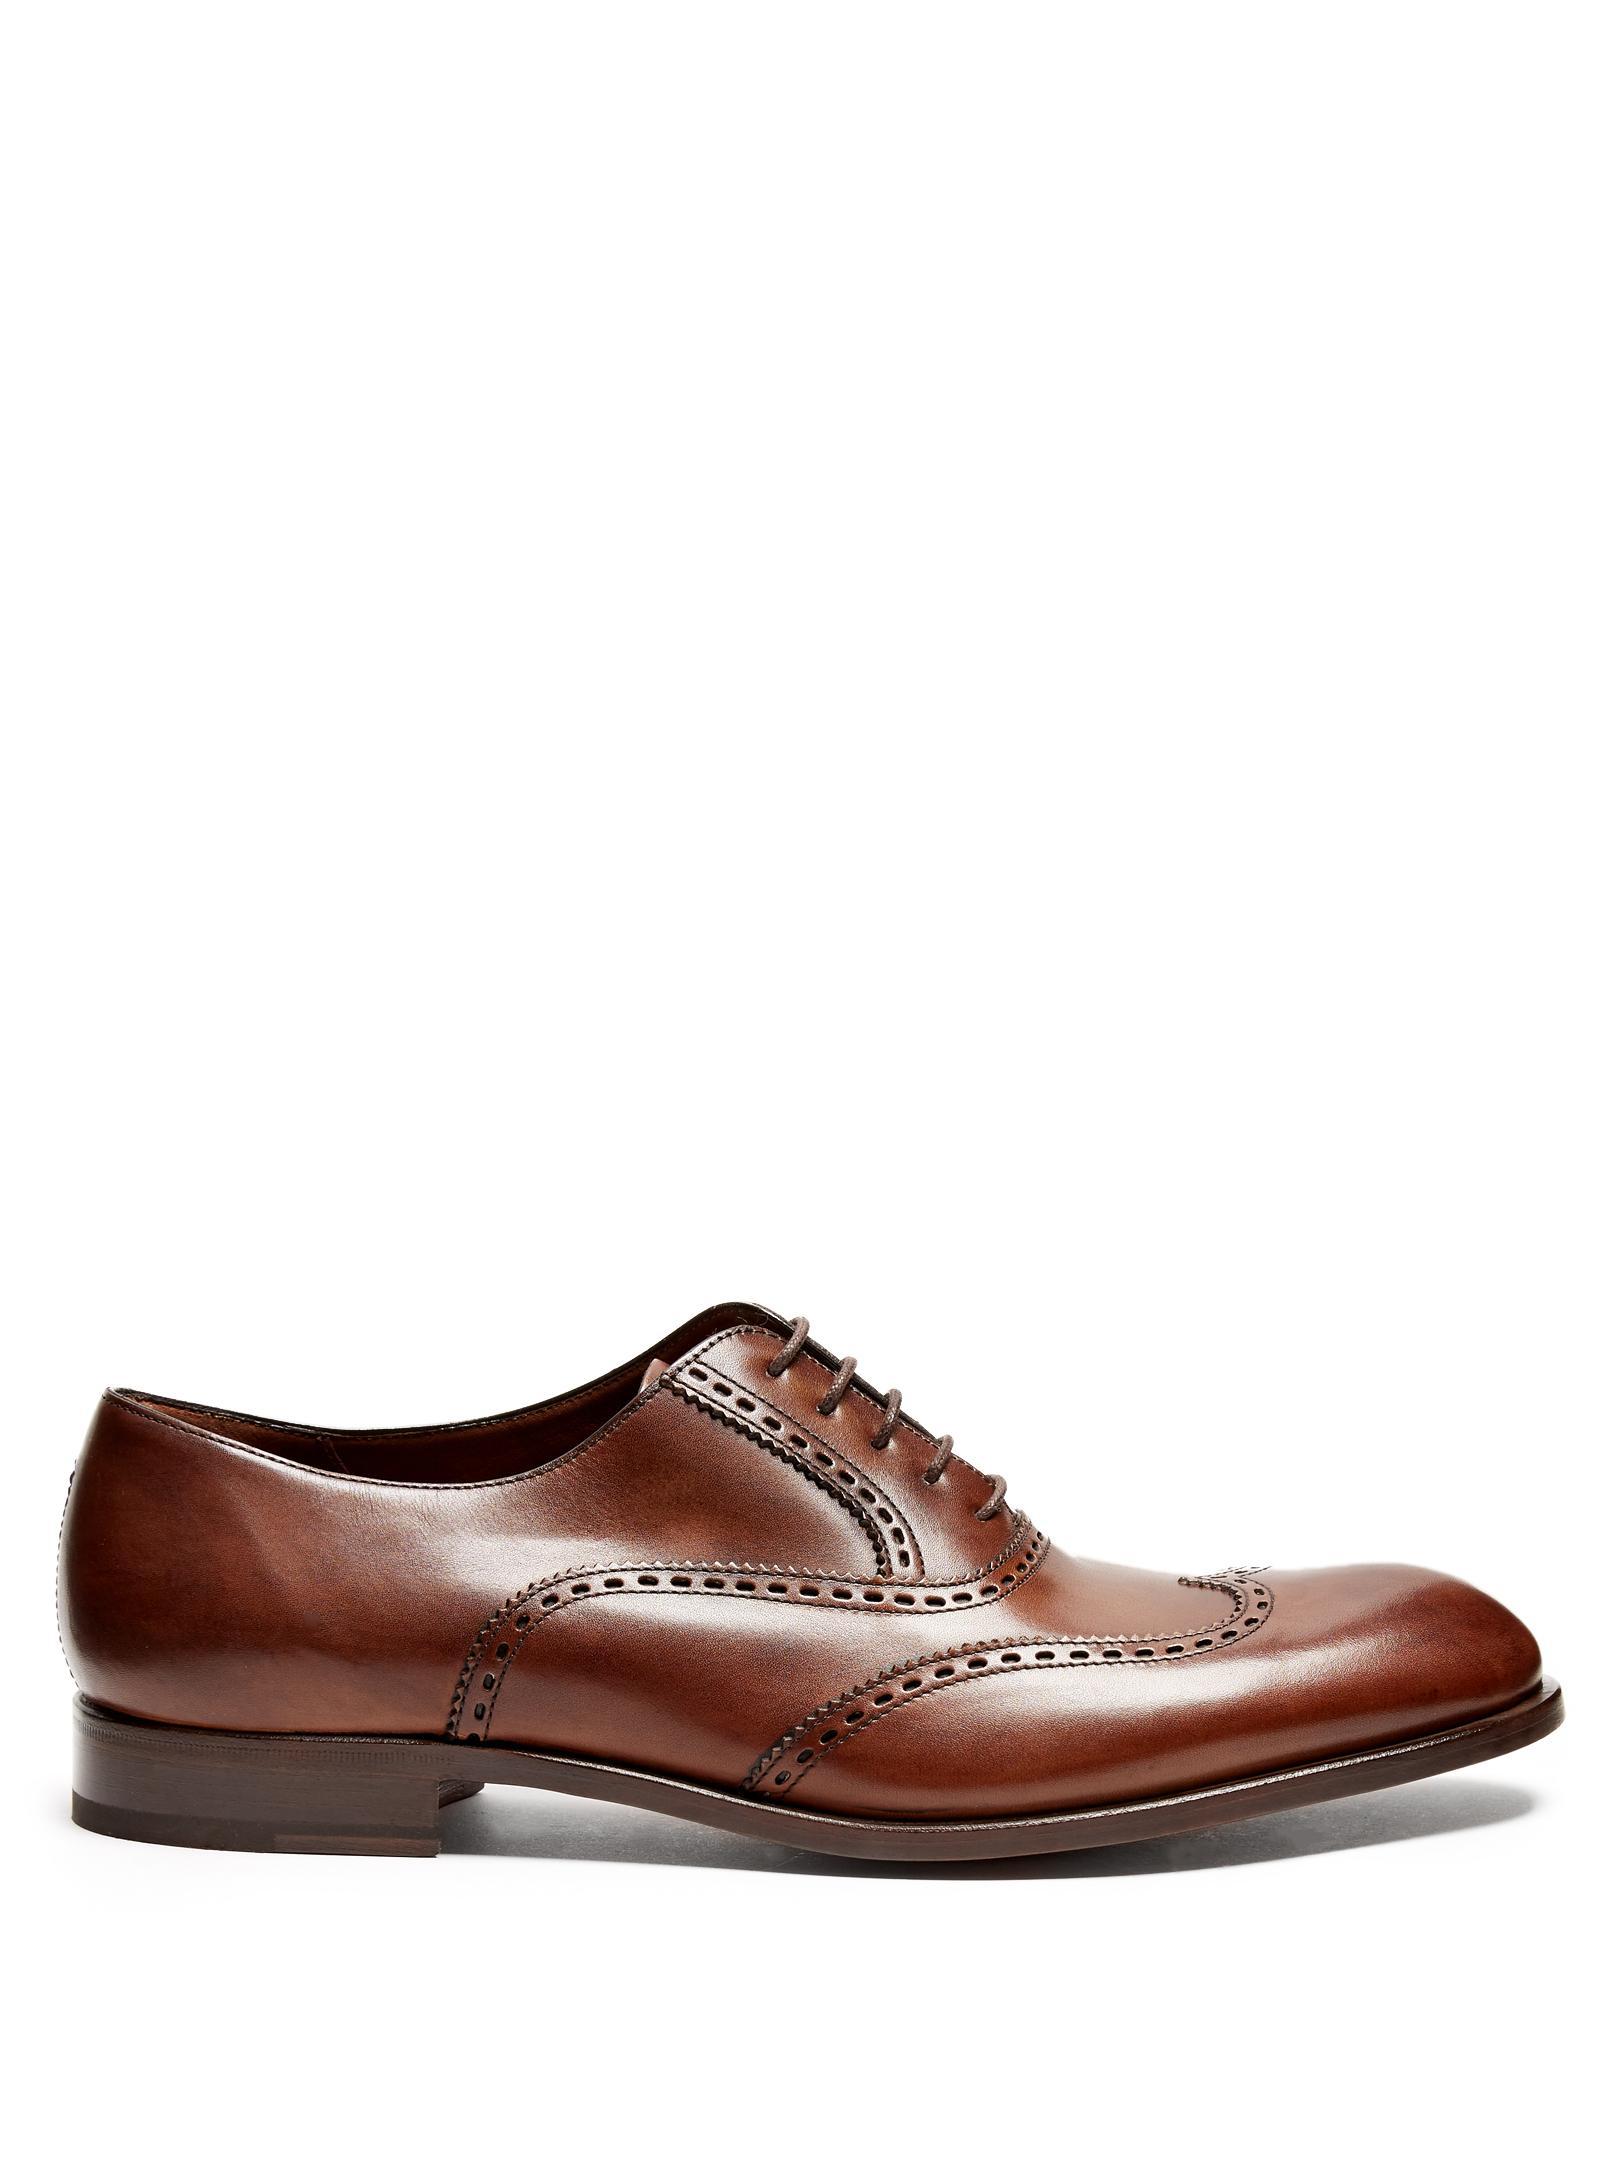 Cheap Barker Shoes Uk